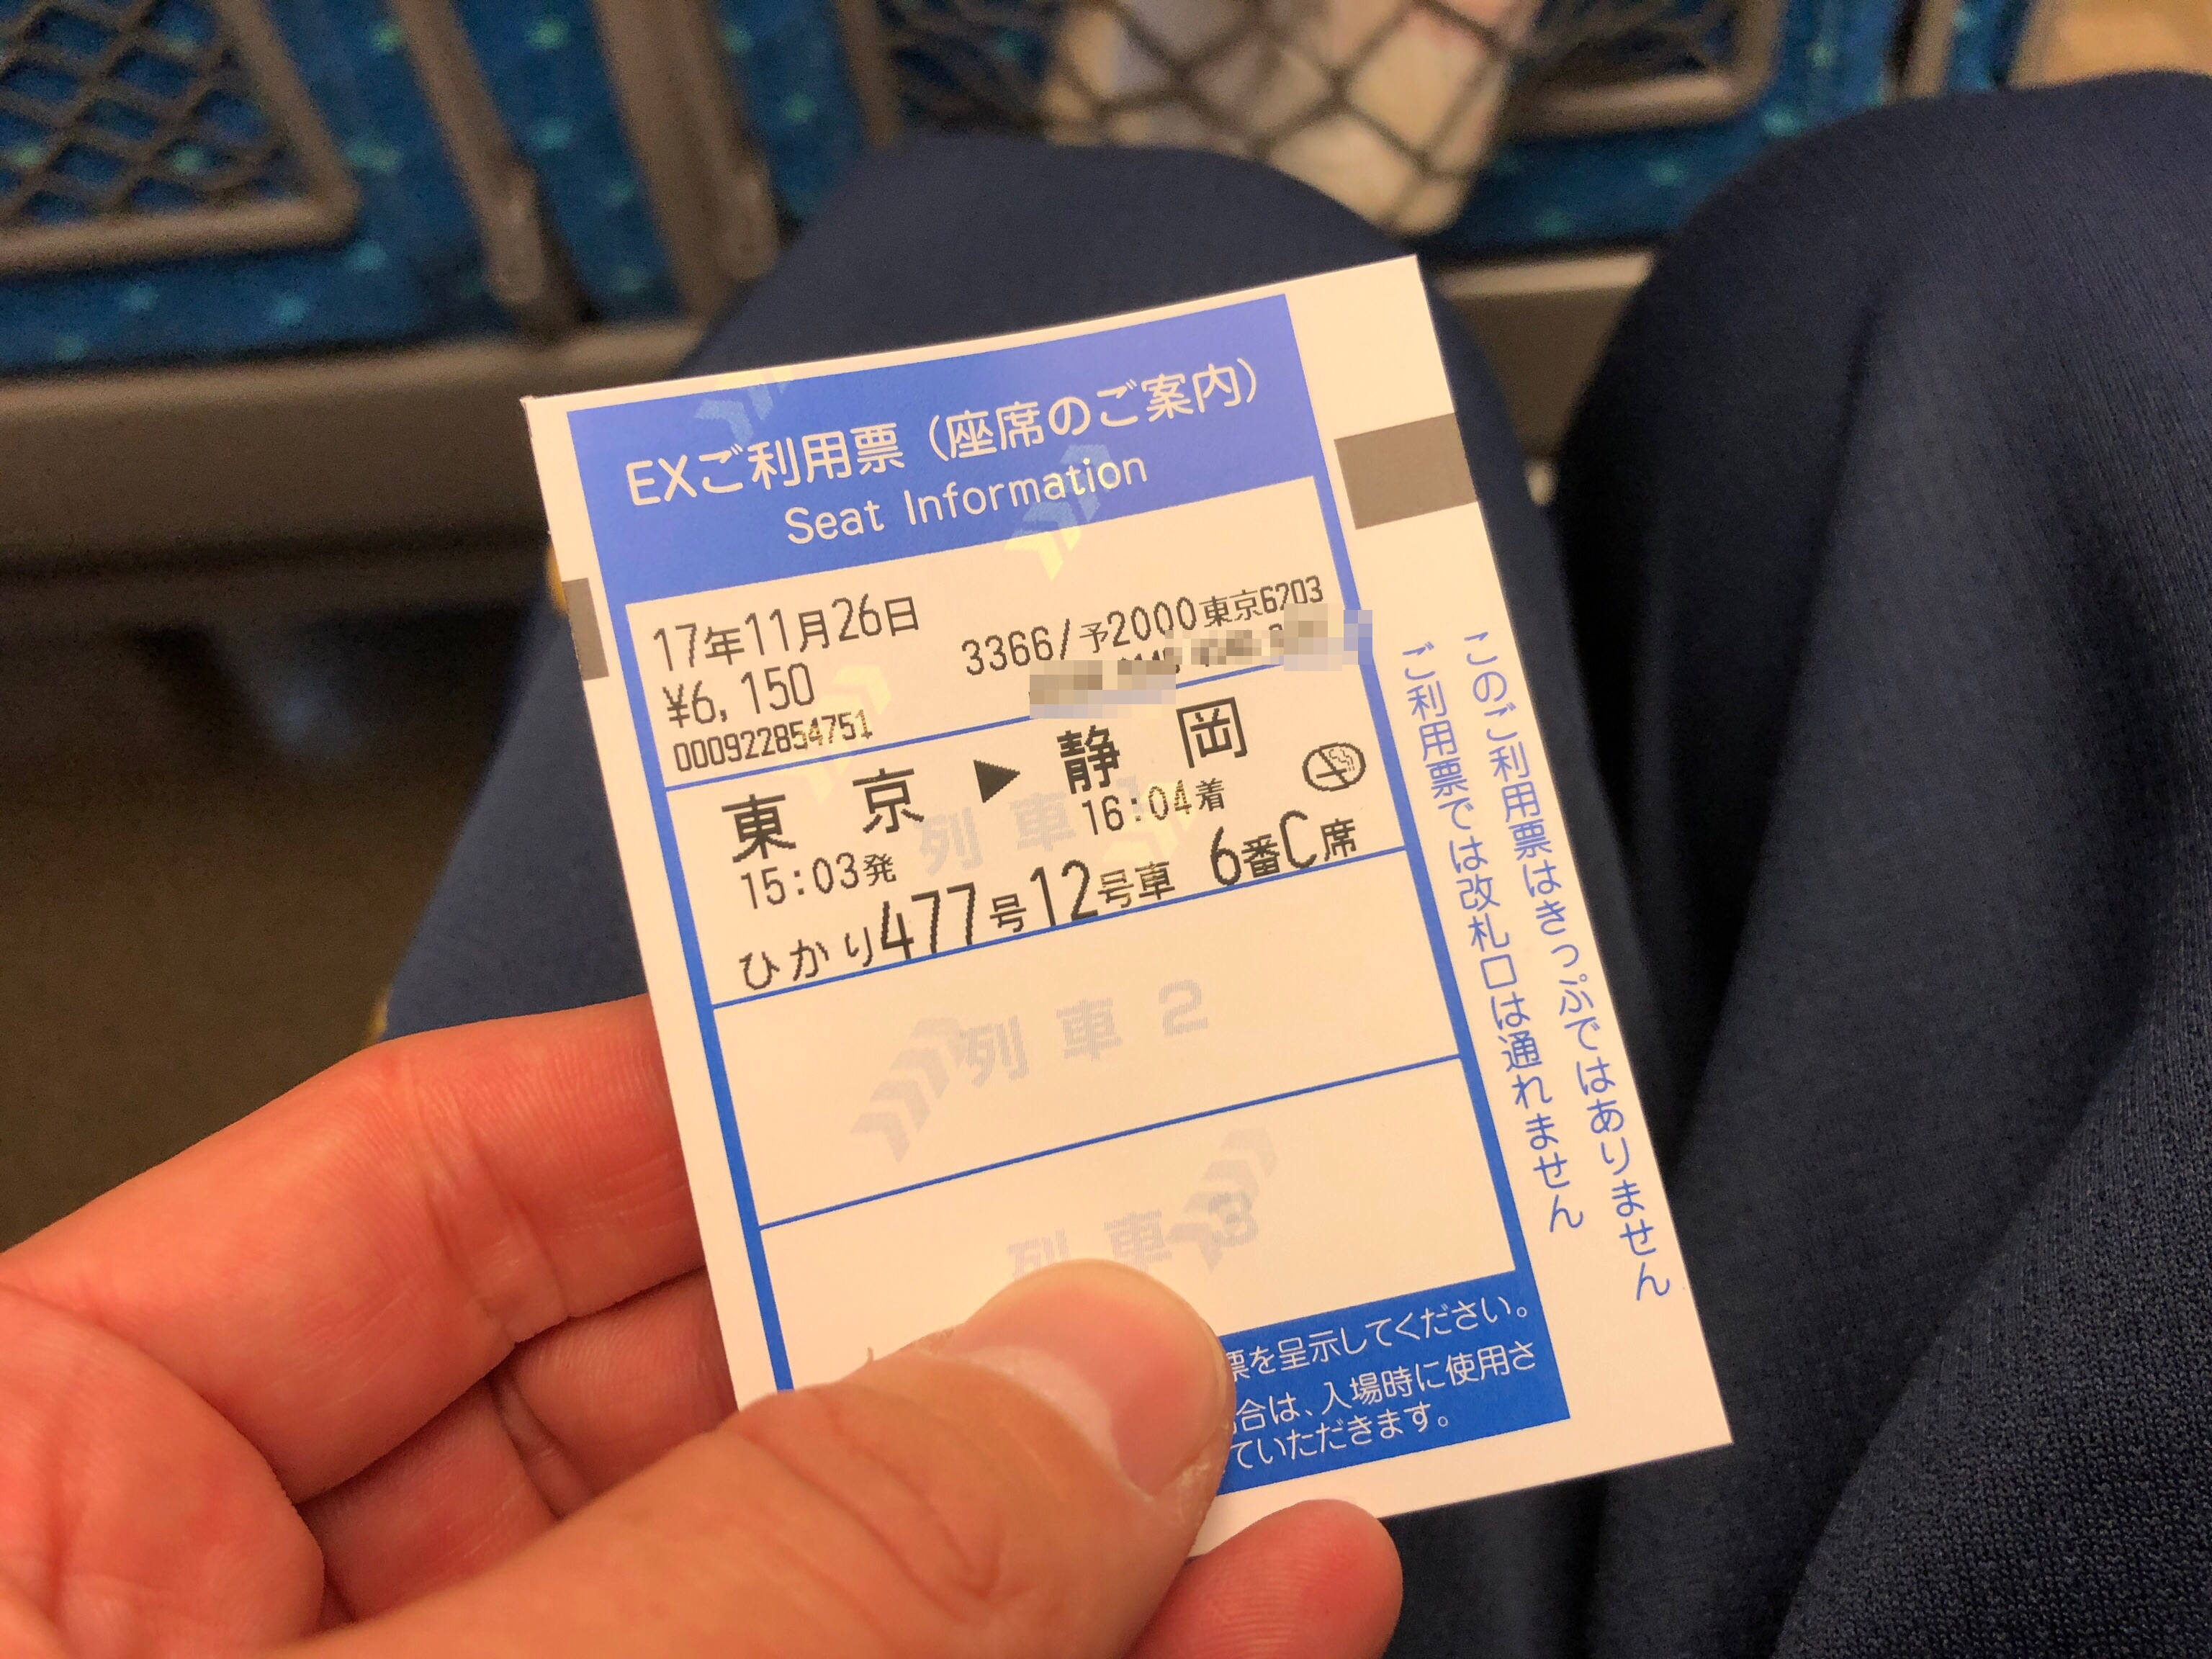 Ex 新幹線 スマート